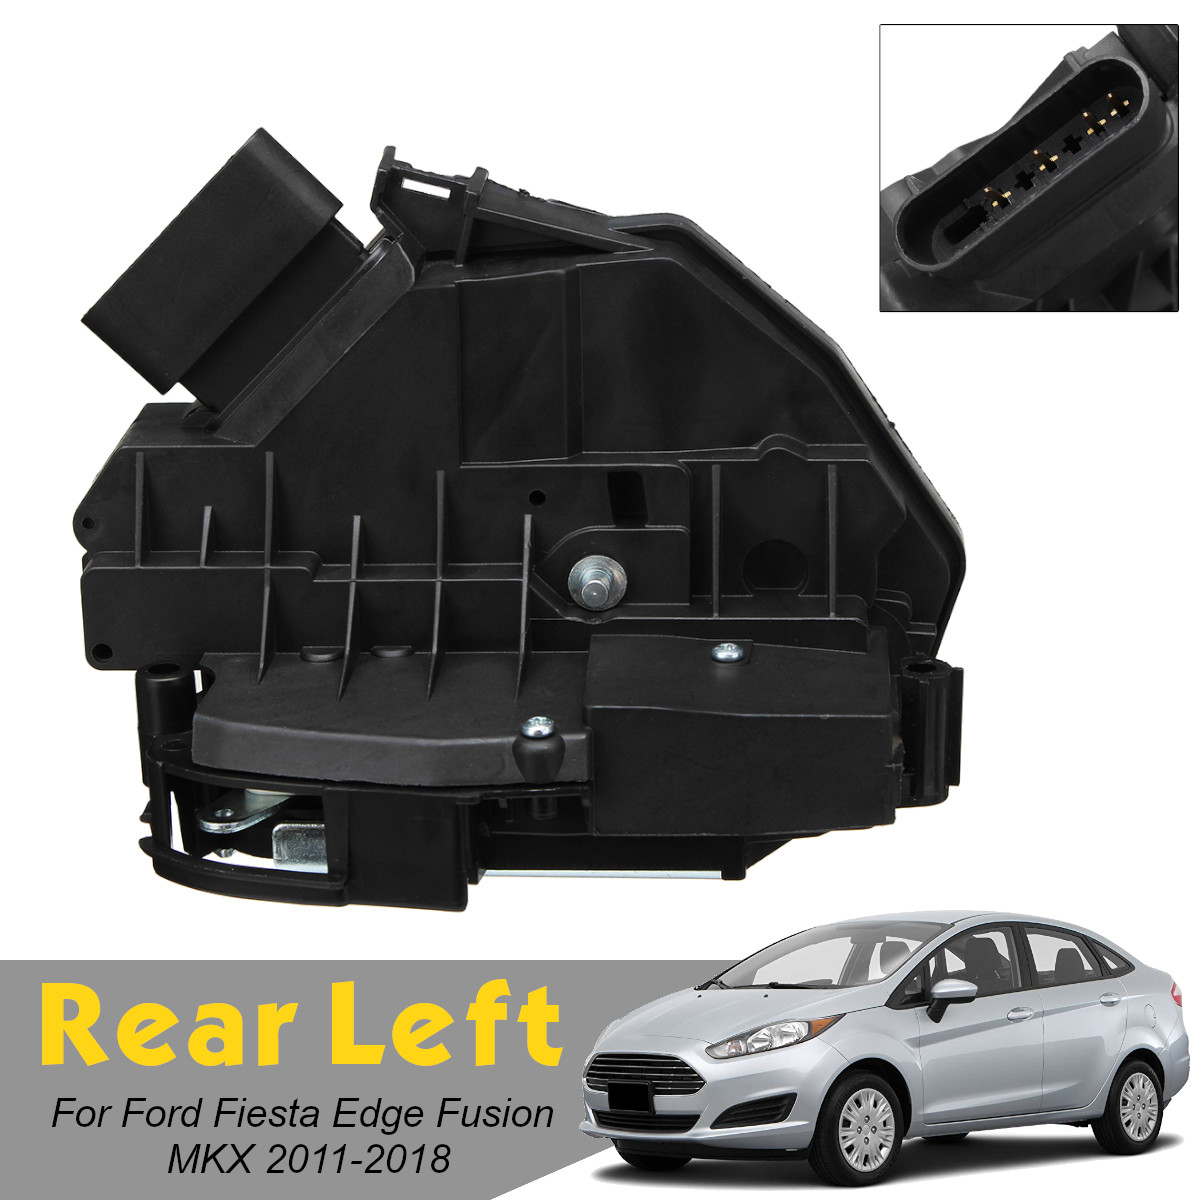 Передняя Задняя Левая Правая Автомобильная дверная защелка привода BE8Z5426413B AE8Z5426413A для Ford для Fiesta для Edge для Fusion MKX 2011 2018